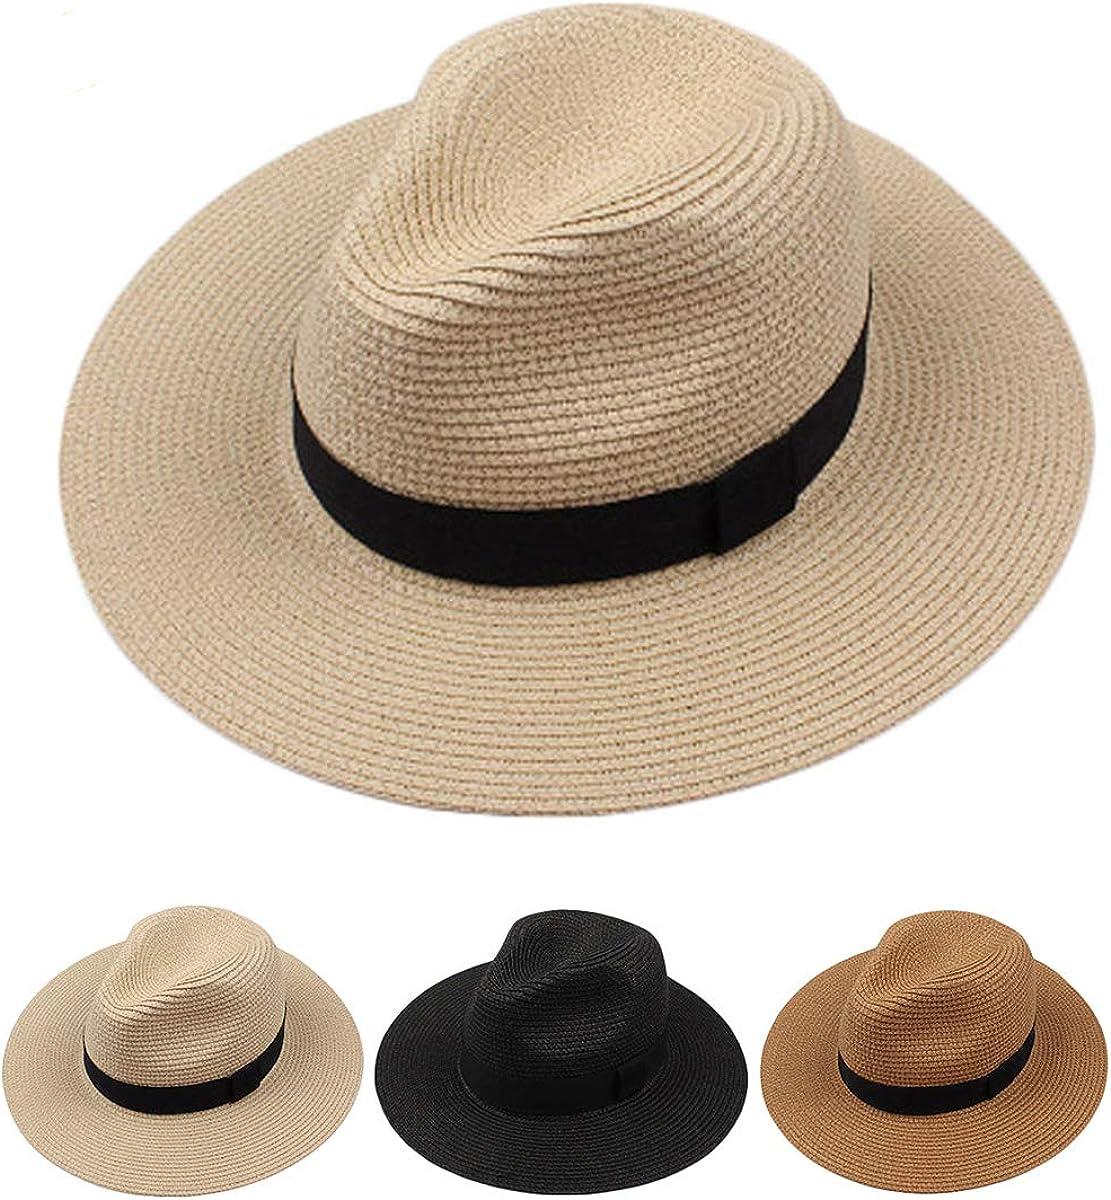 Style Cream, L Head Circum 22.8-23.6 Womens Wide Brim Straw Panama Hat Fedora Summer Beach Sun Hat UPF